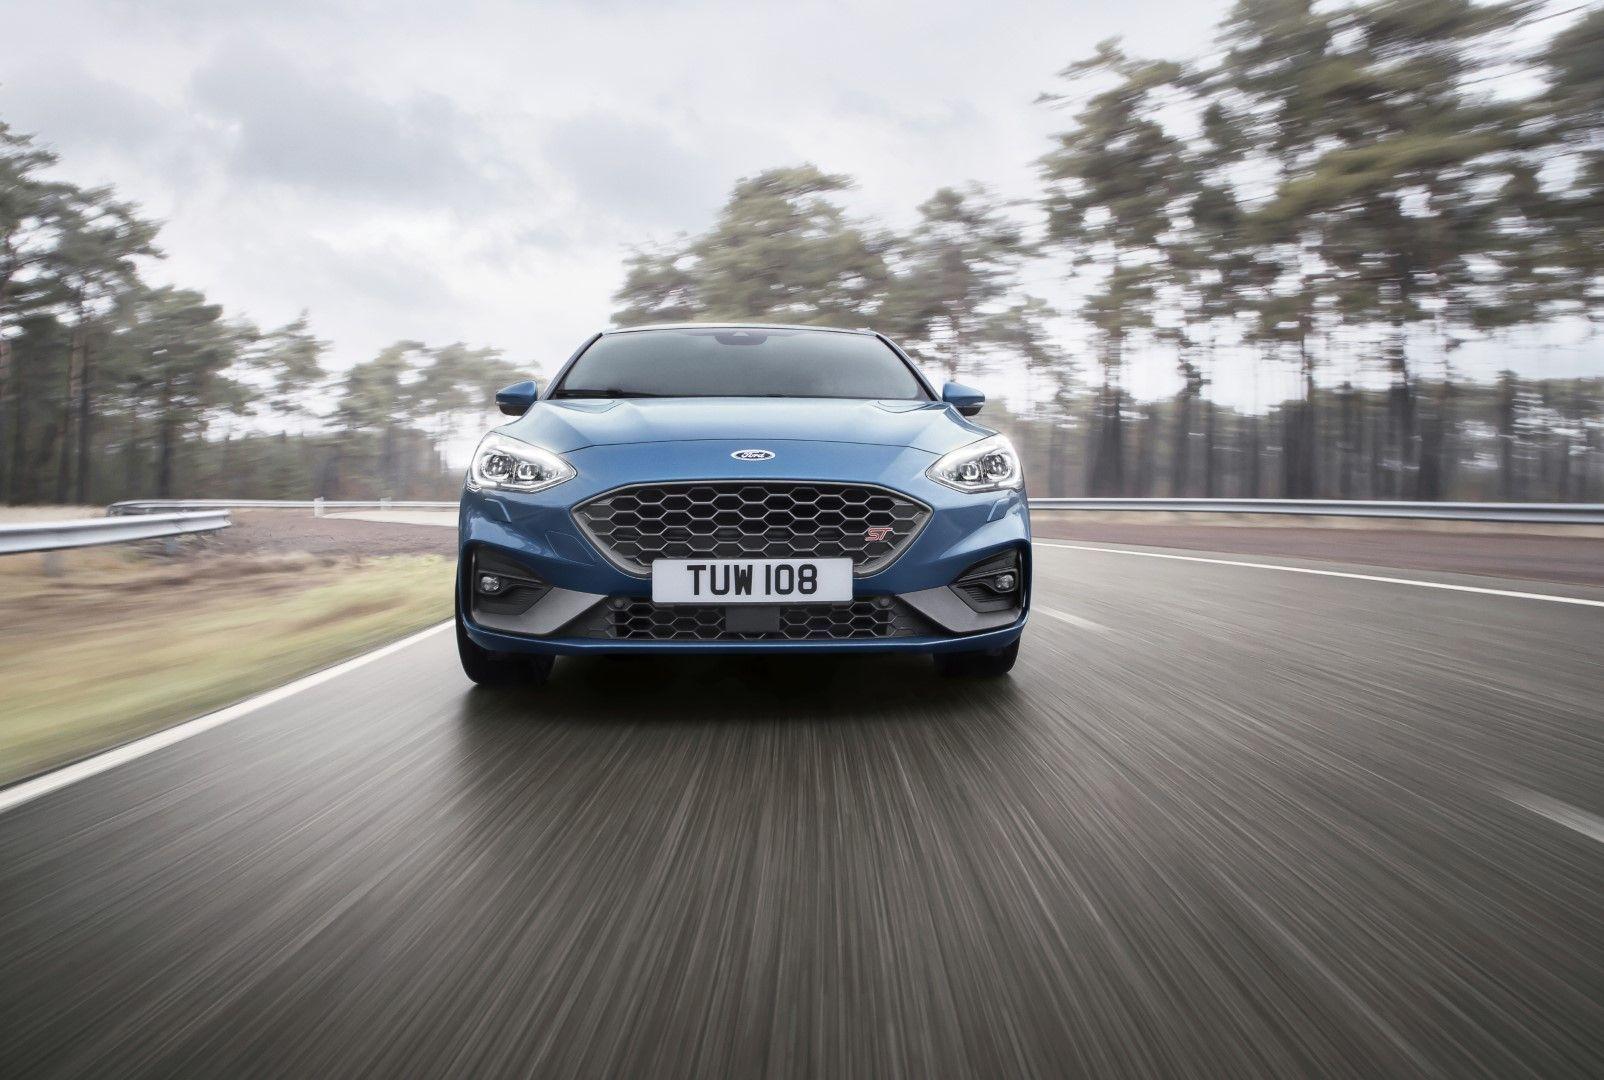 2019 Ford Focus ST. 2.3L EcoBoost, 280 HP, 310 lbft